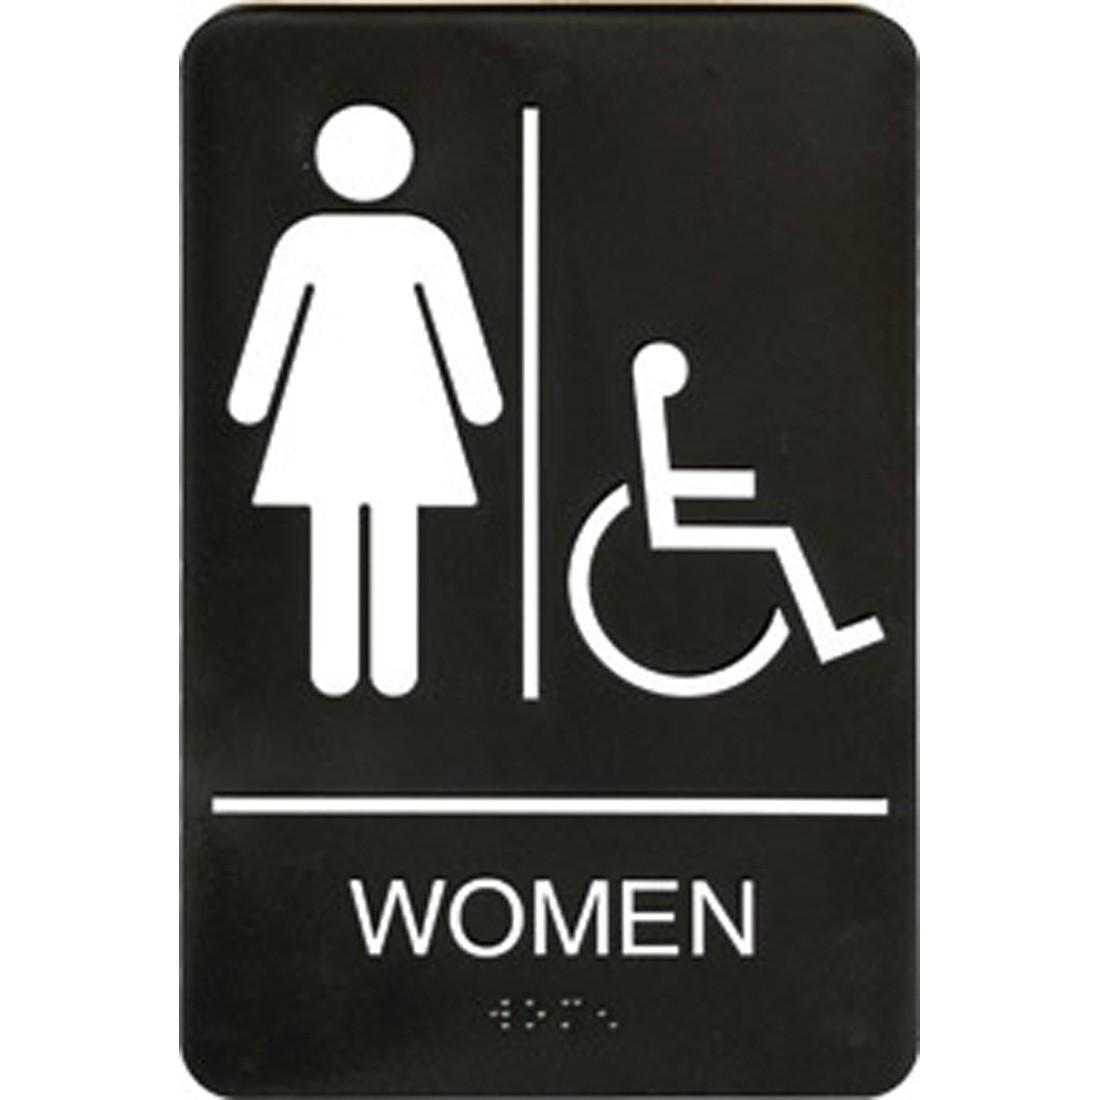 Womens Public Bathroom Toilet Video: WoMENS RESTROOM SIGN